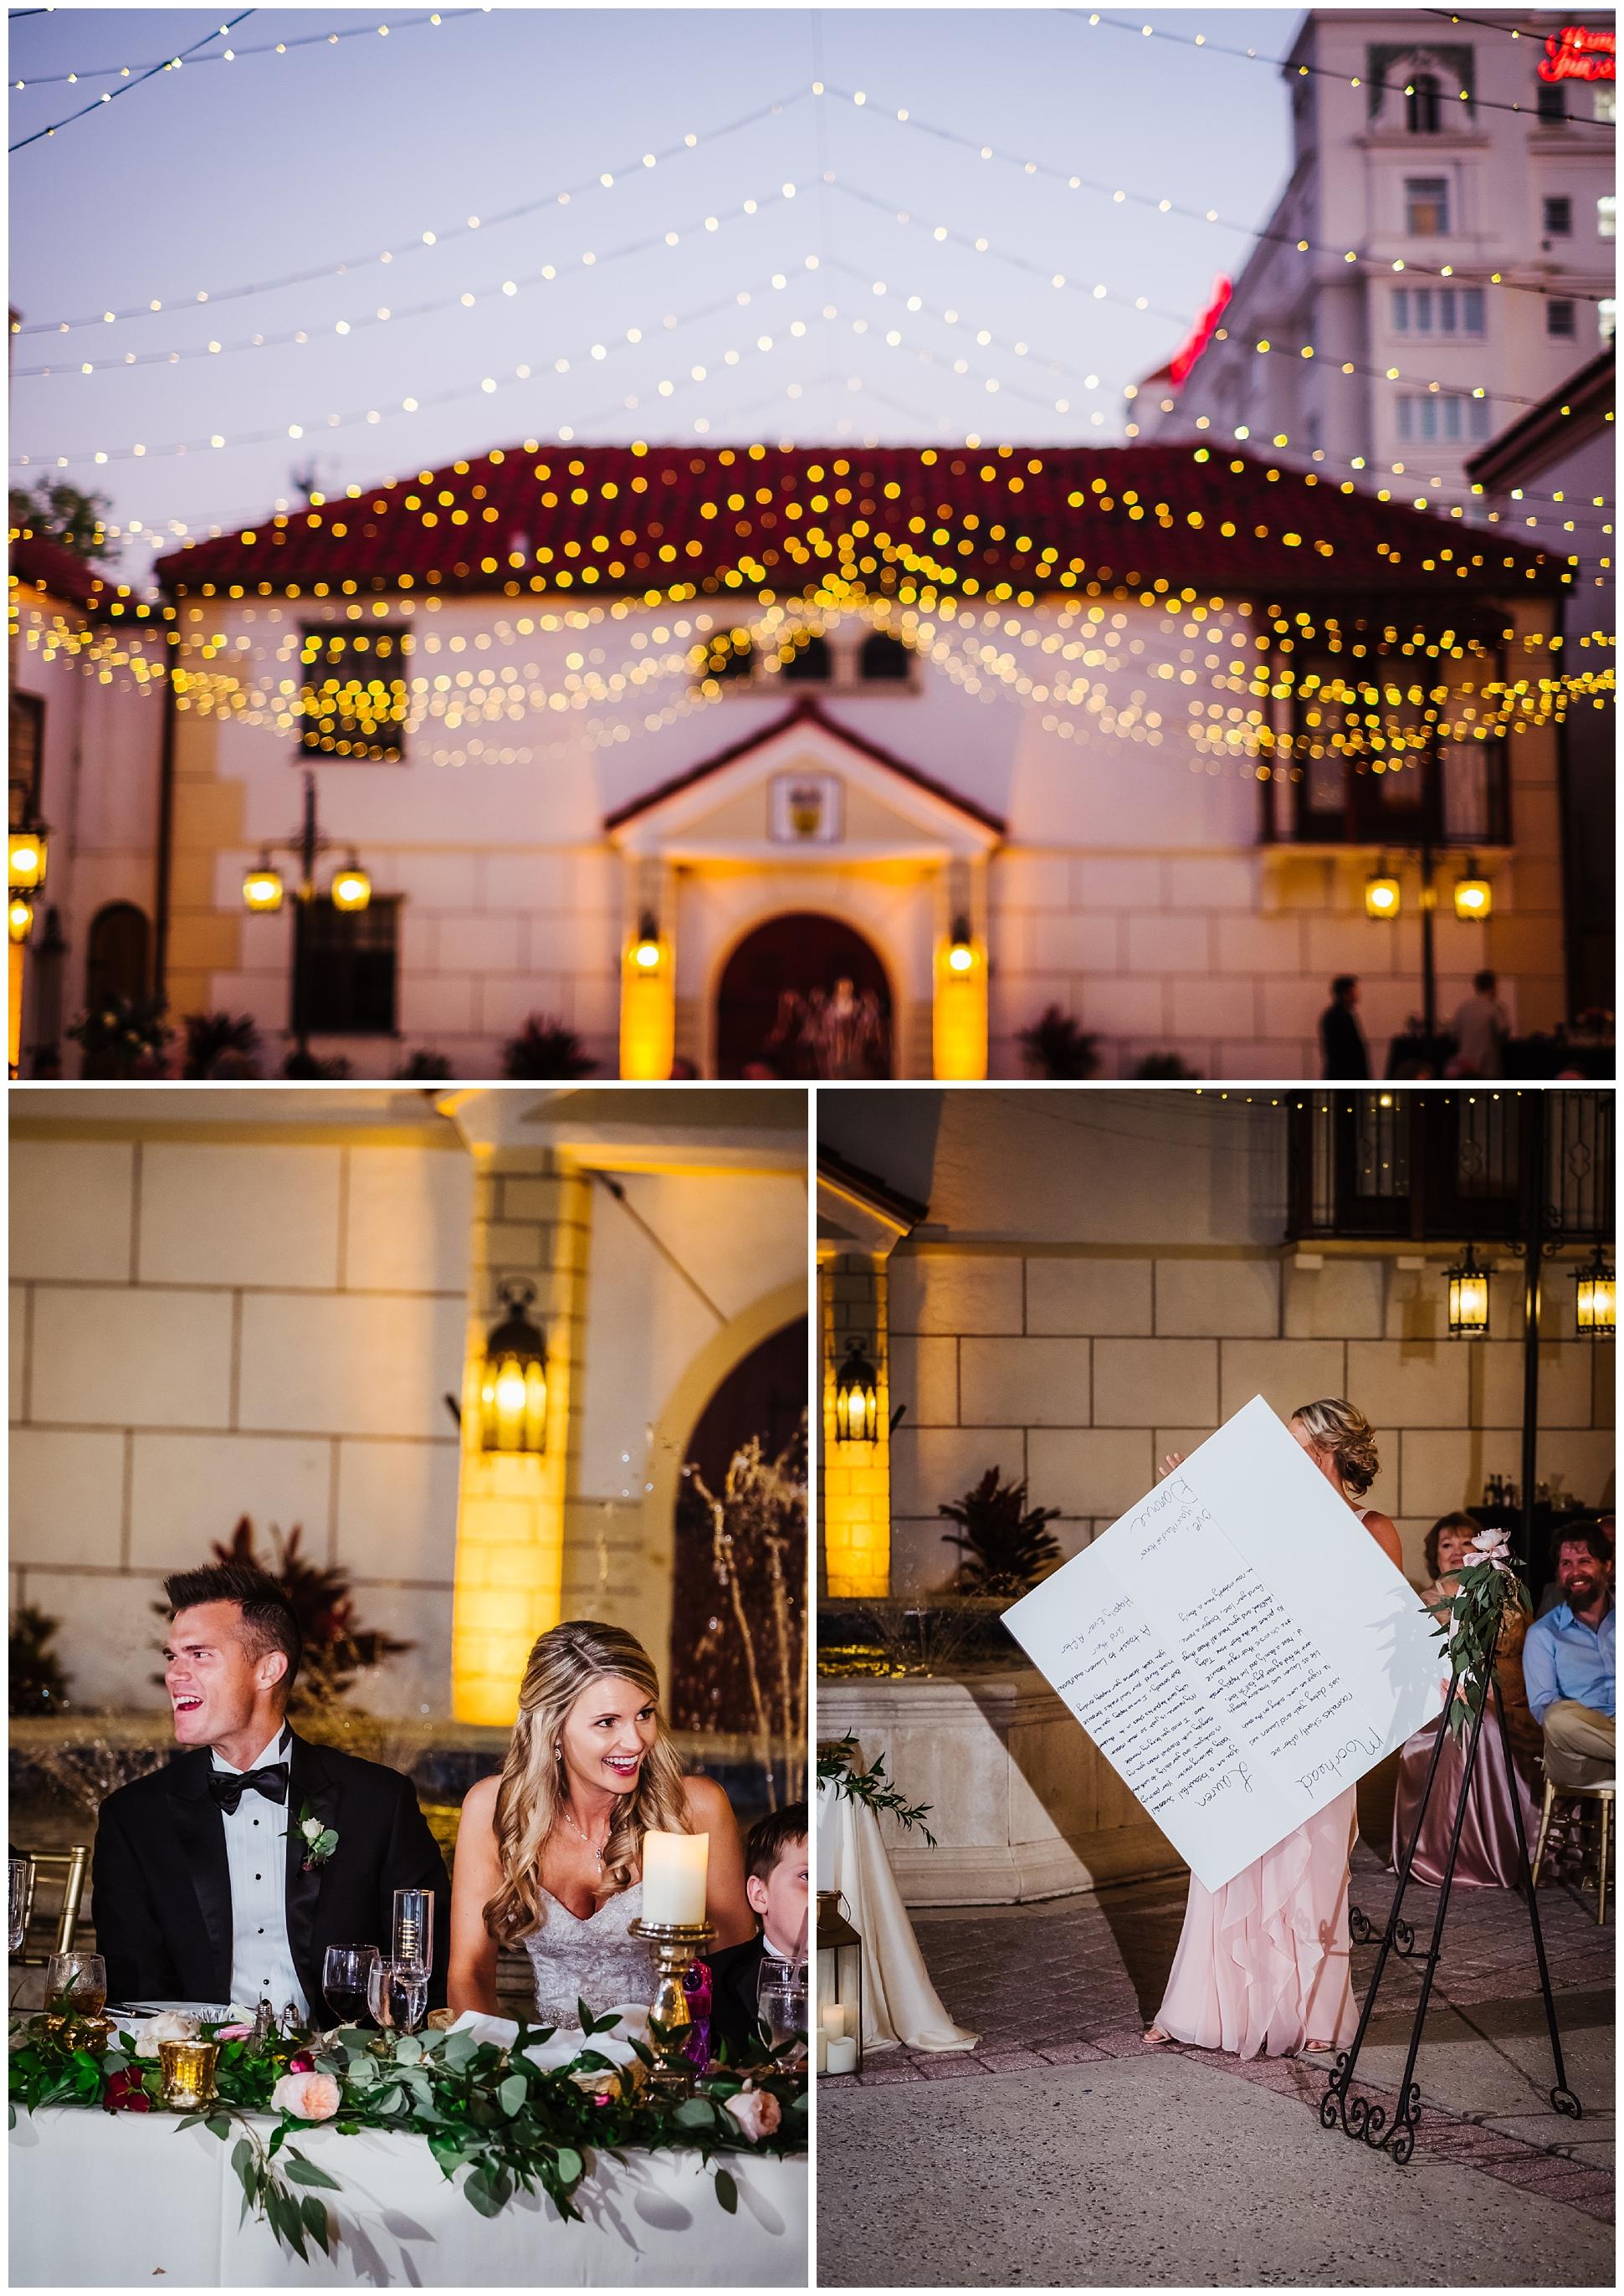 tampa-bradenton-wedding-photographer-south-florida-museum-classic-blush-gold-alpacas-sparklers_0080.jpg